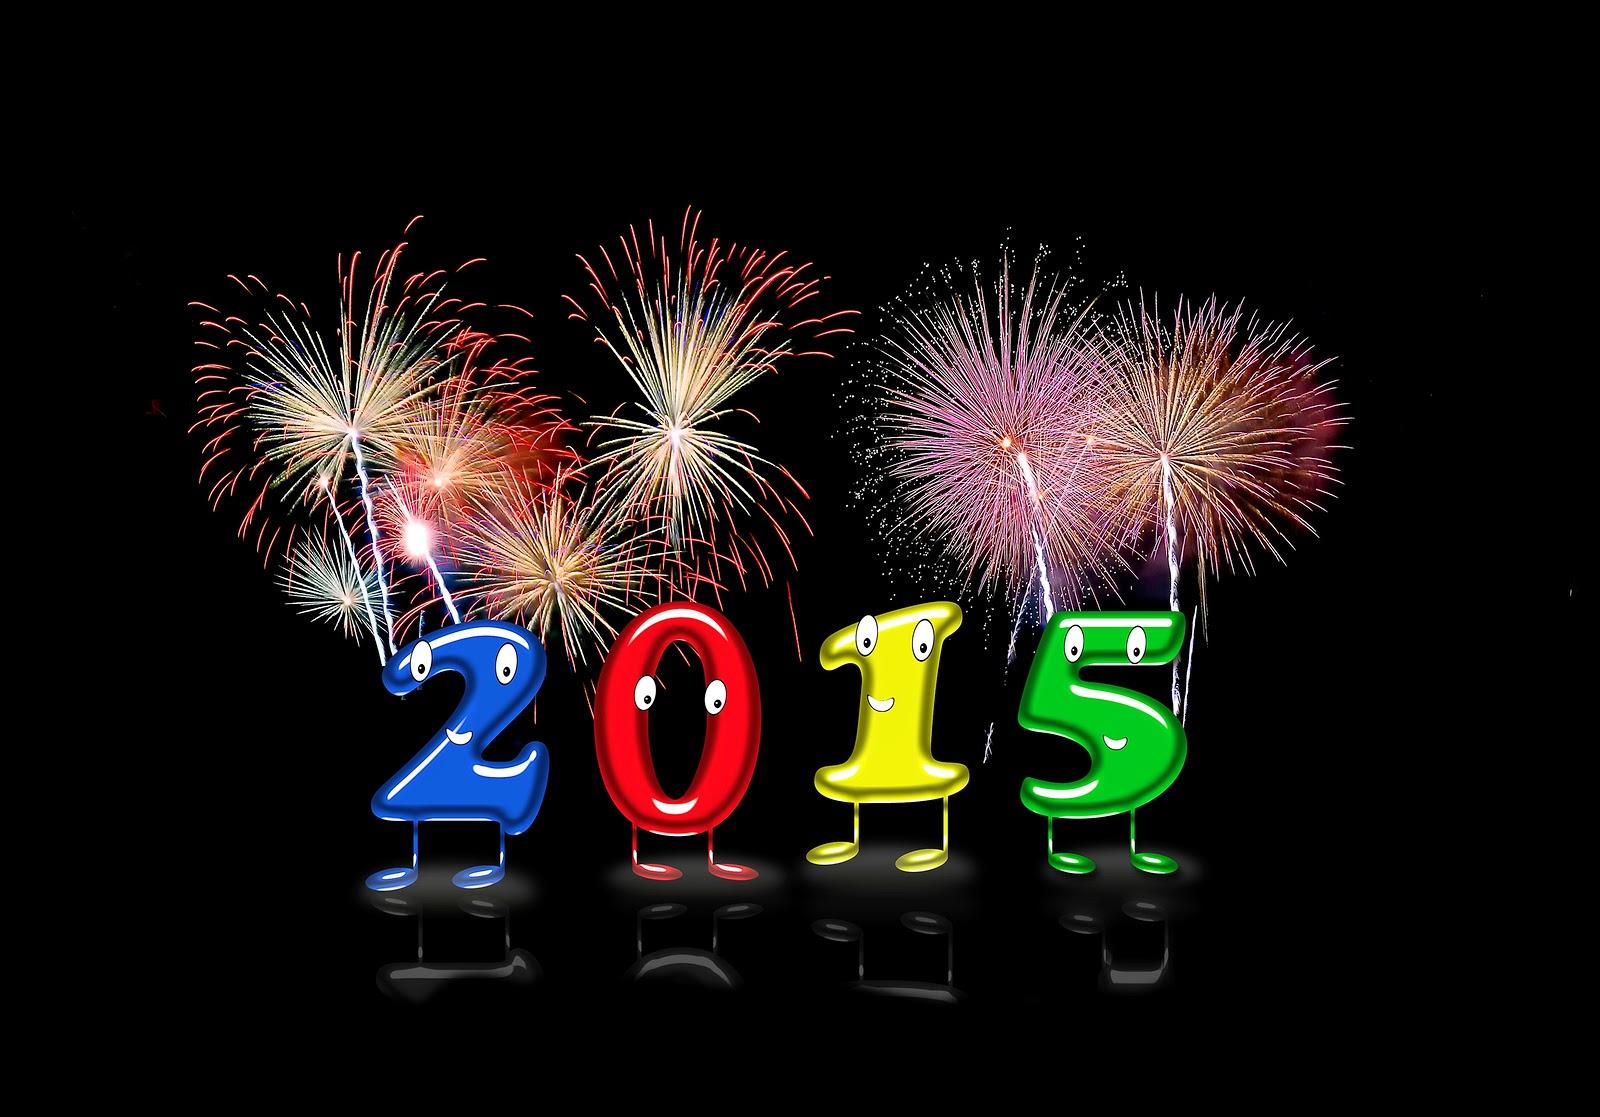 Selamat Tahun Baru 2014 & Refleksi Kehidupan